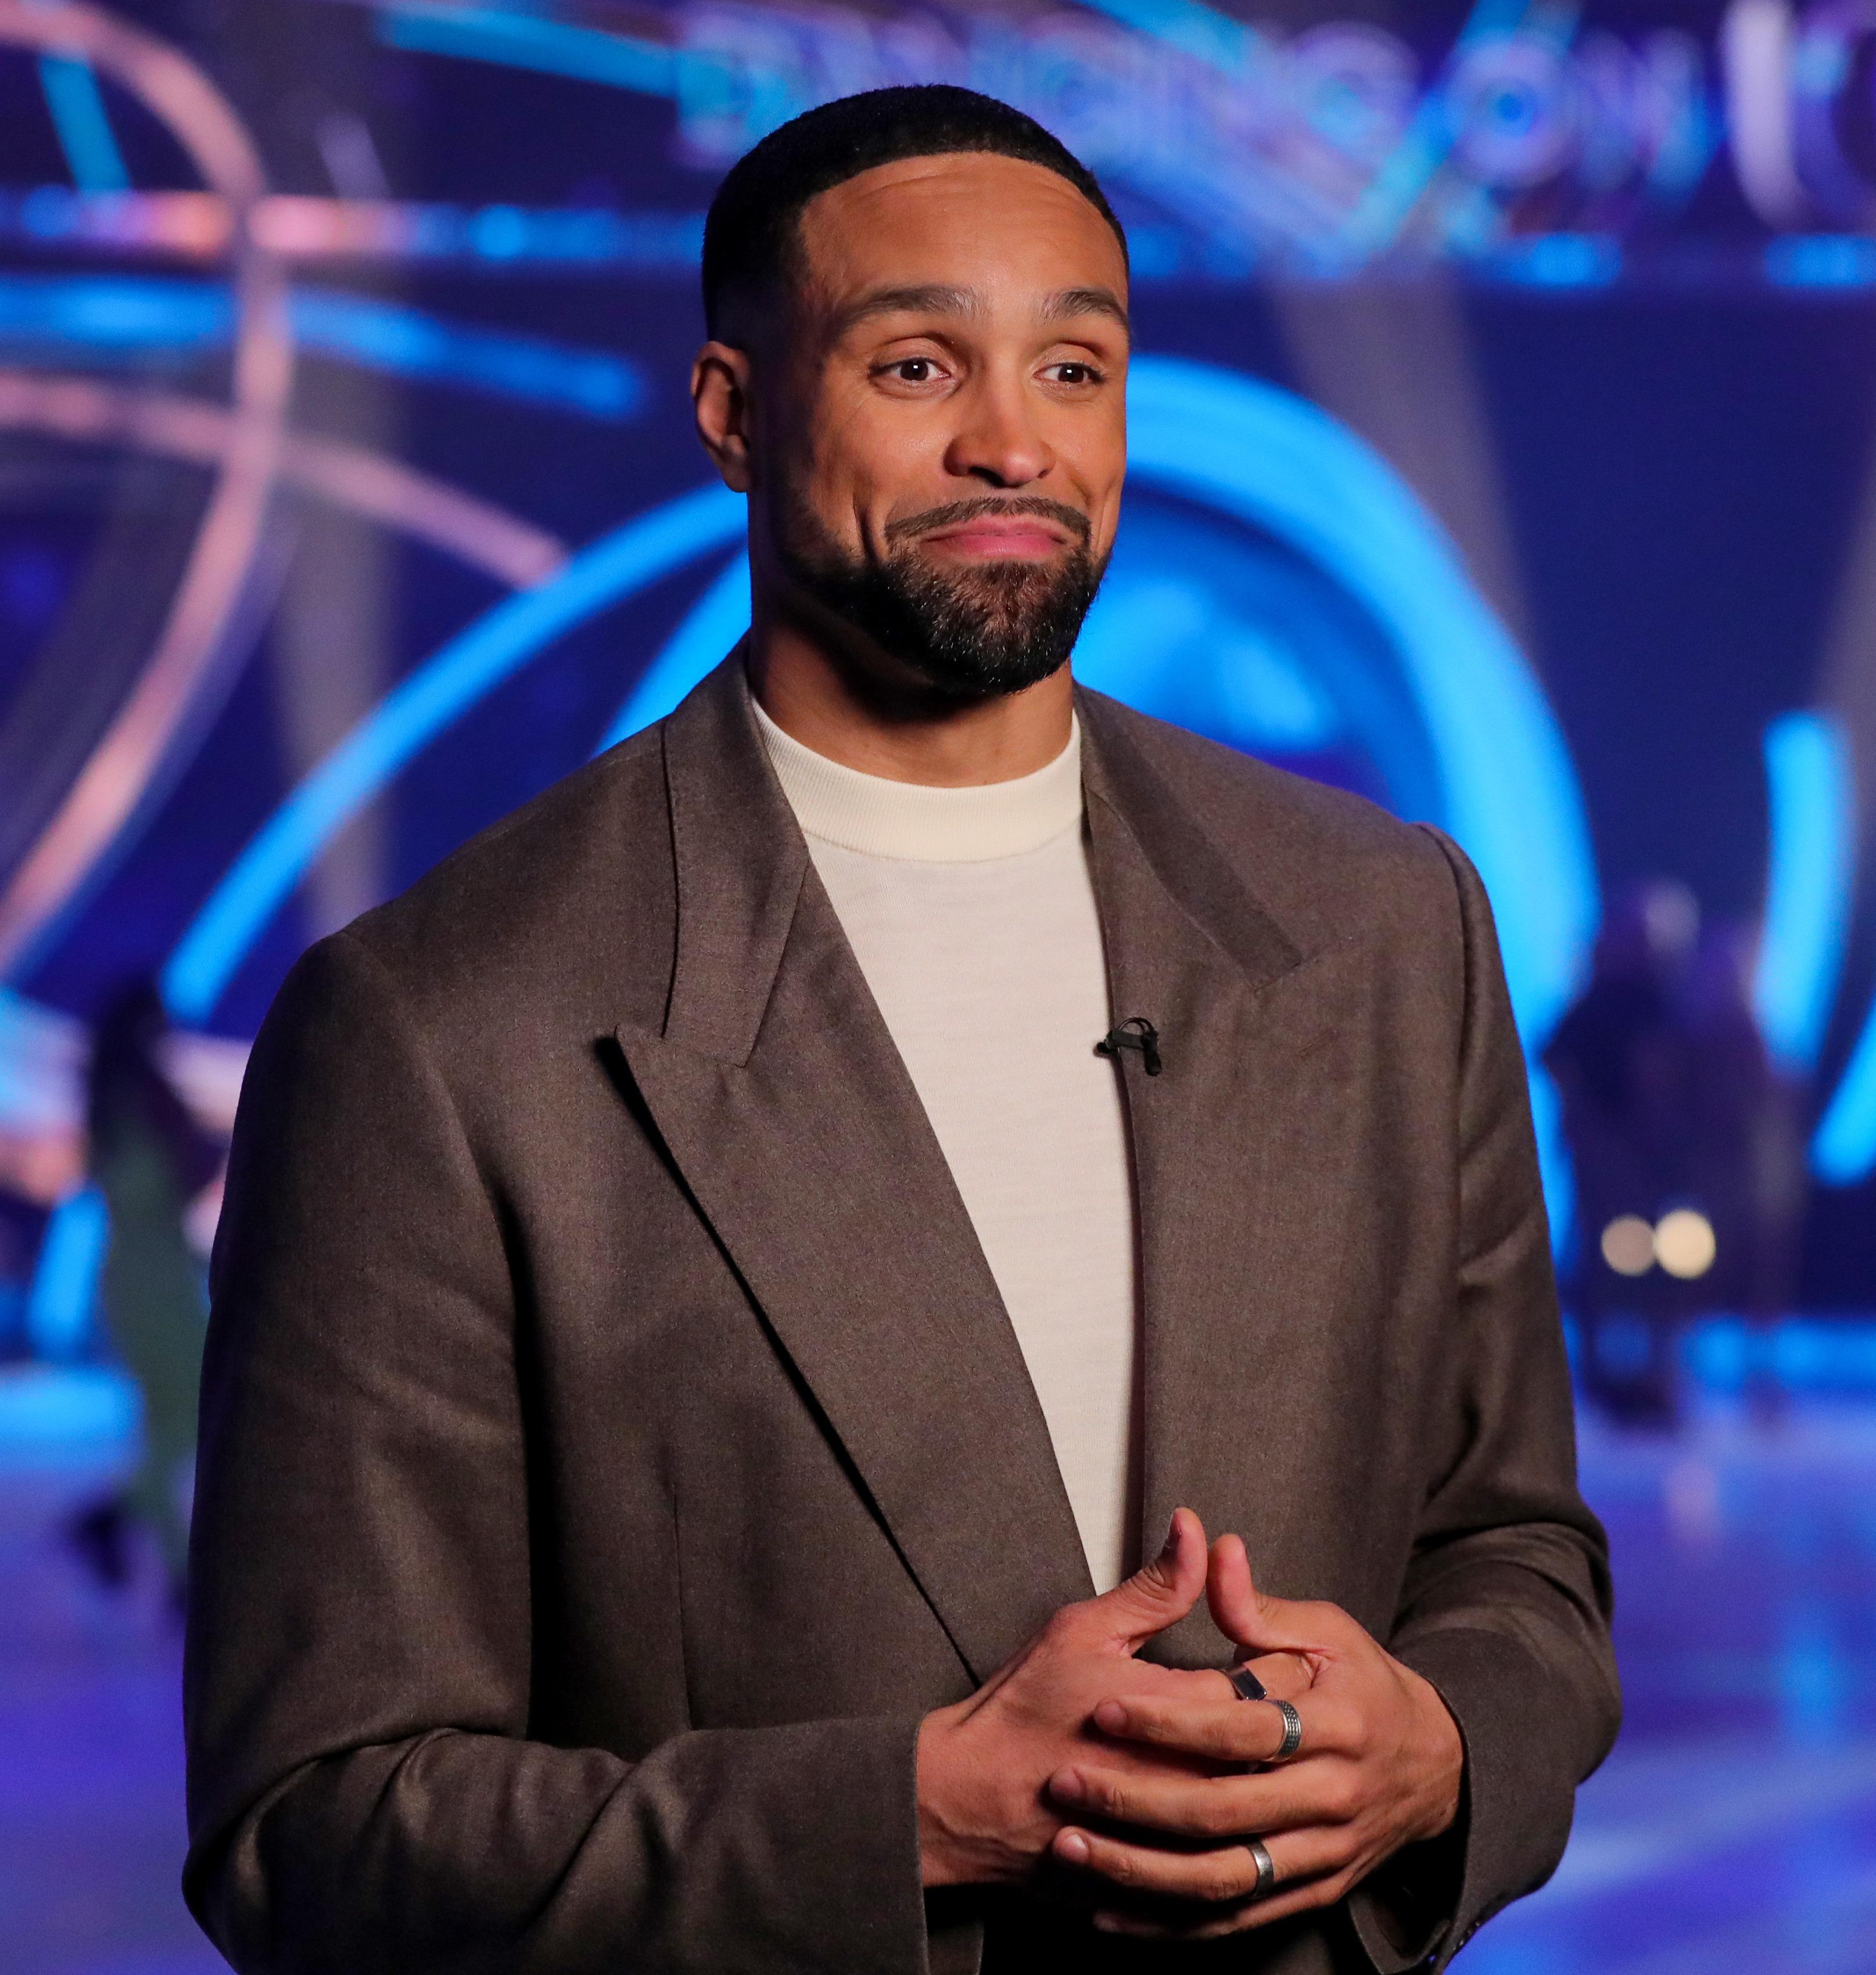 Ashley Banjo's brother Jordan slams troll who accuses Dancing On Ice judge  of 'racist scoring' - 247 News Around The World